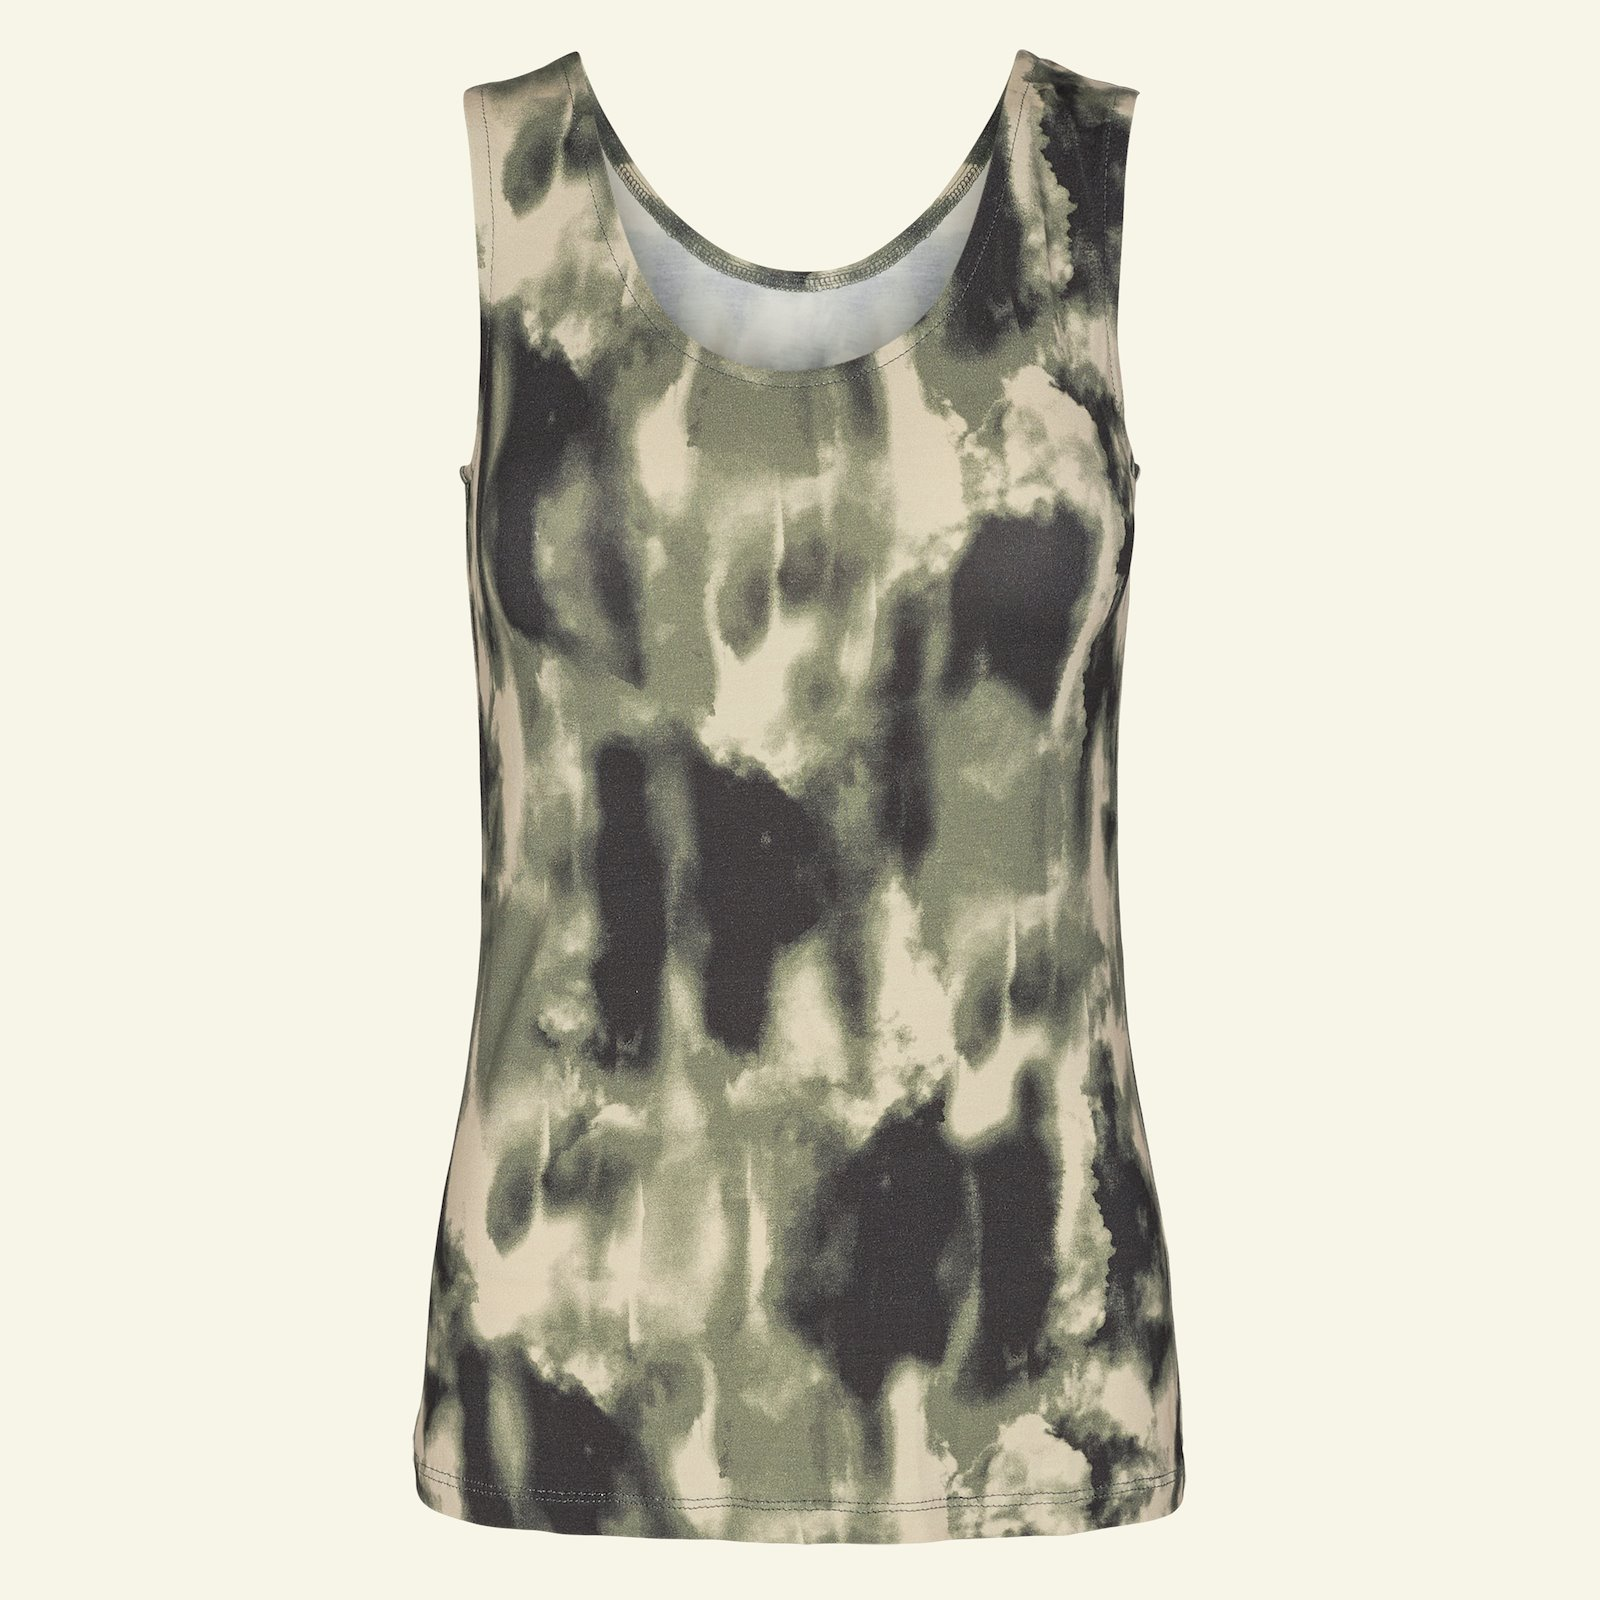 Top and dress, 34/6 p22071_272691_sskit